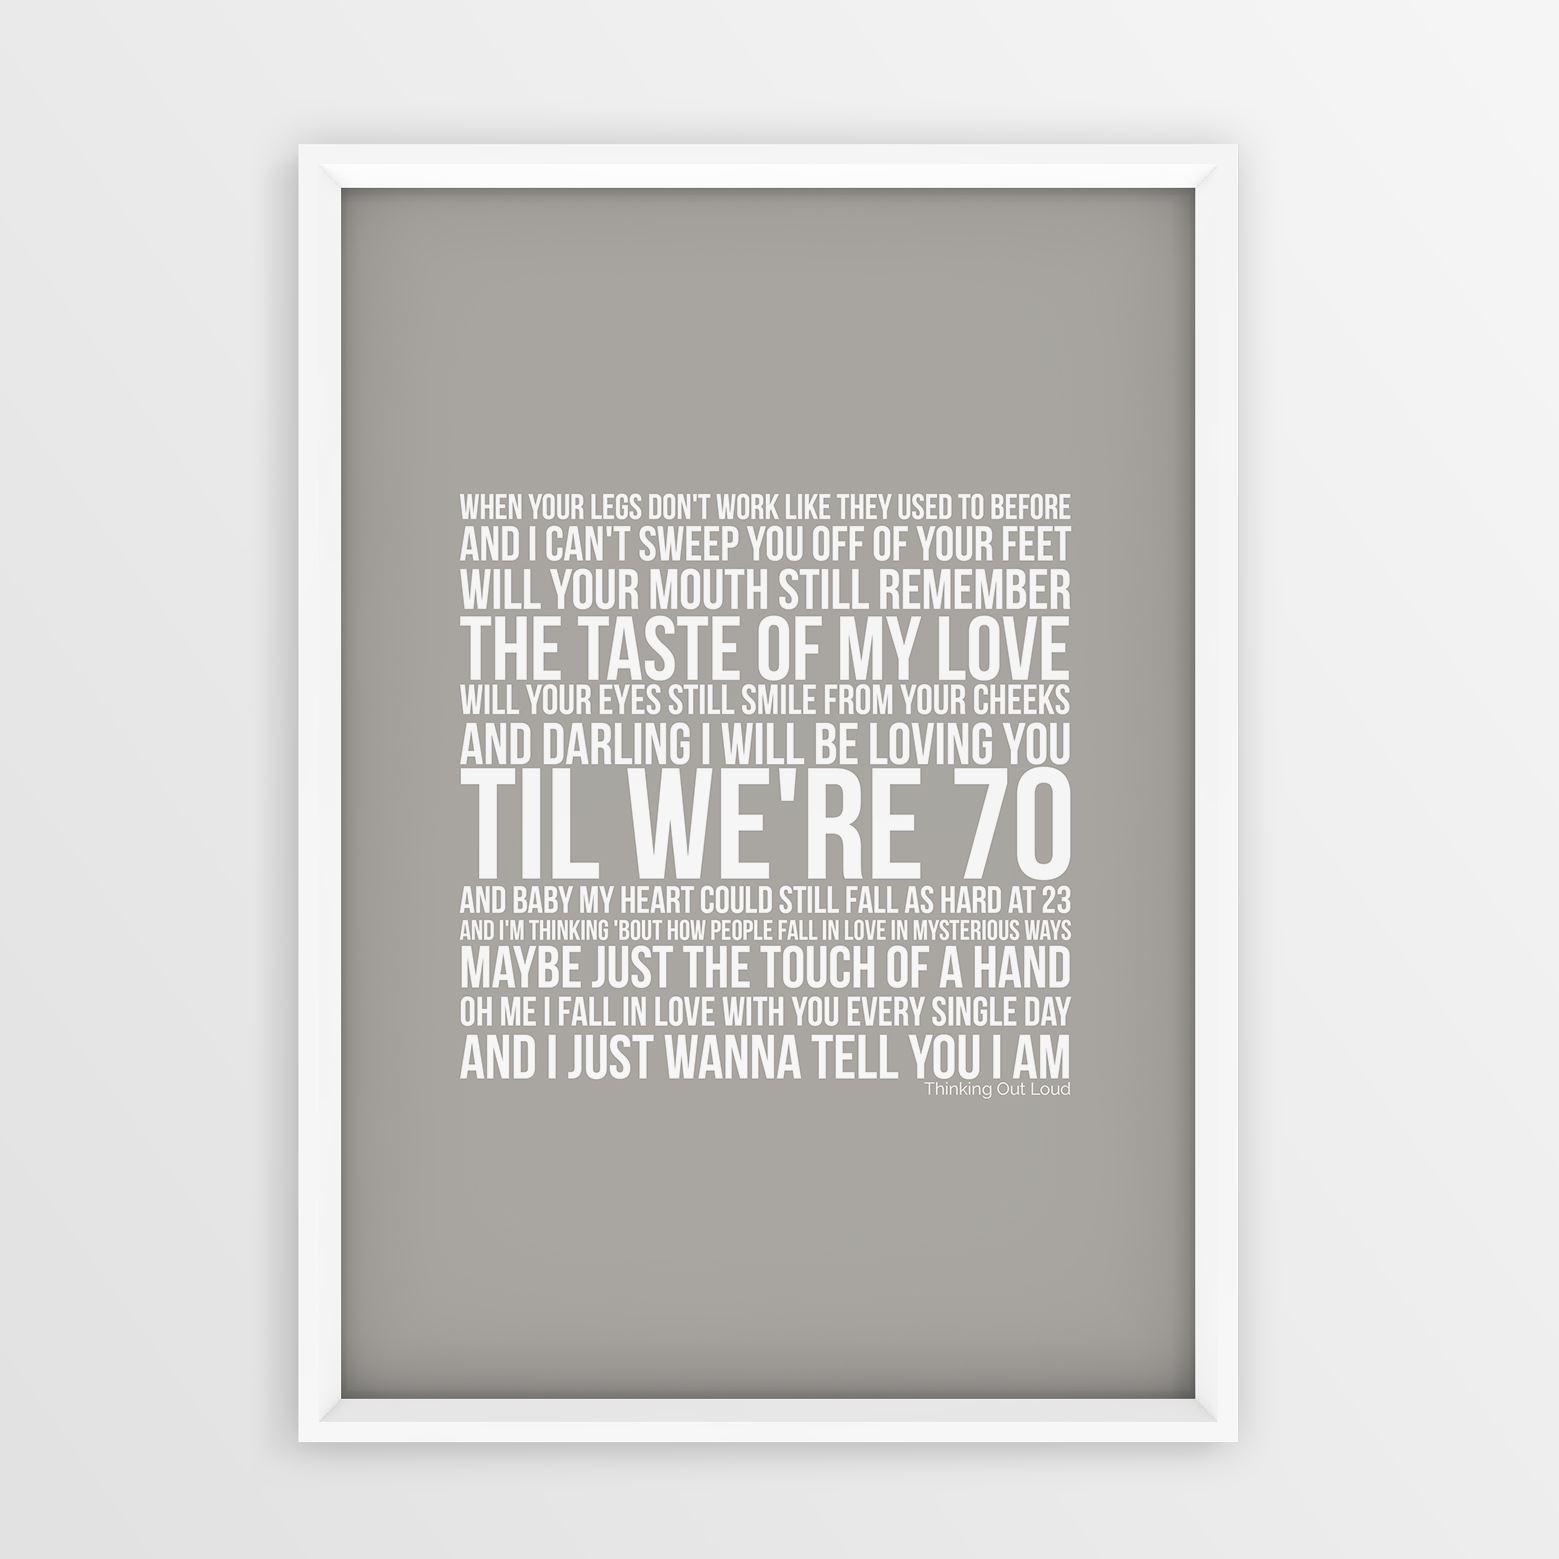 Ed Sheeran Thinking Out Loud Art Poster Song Wall Lyrics A4 A3 Sizes ...